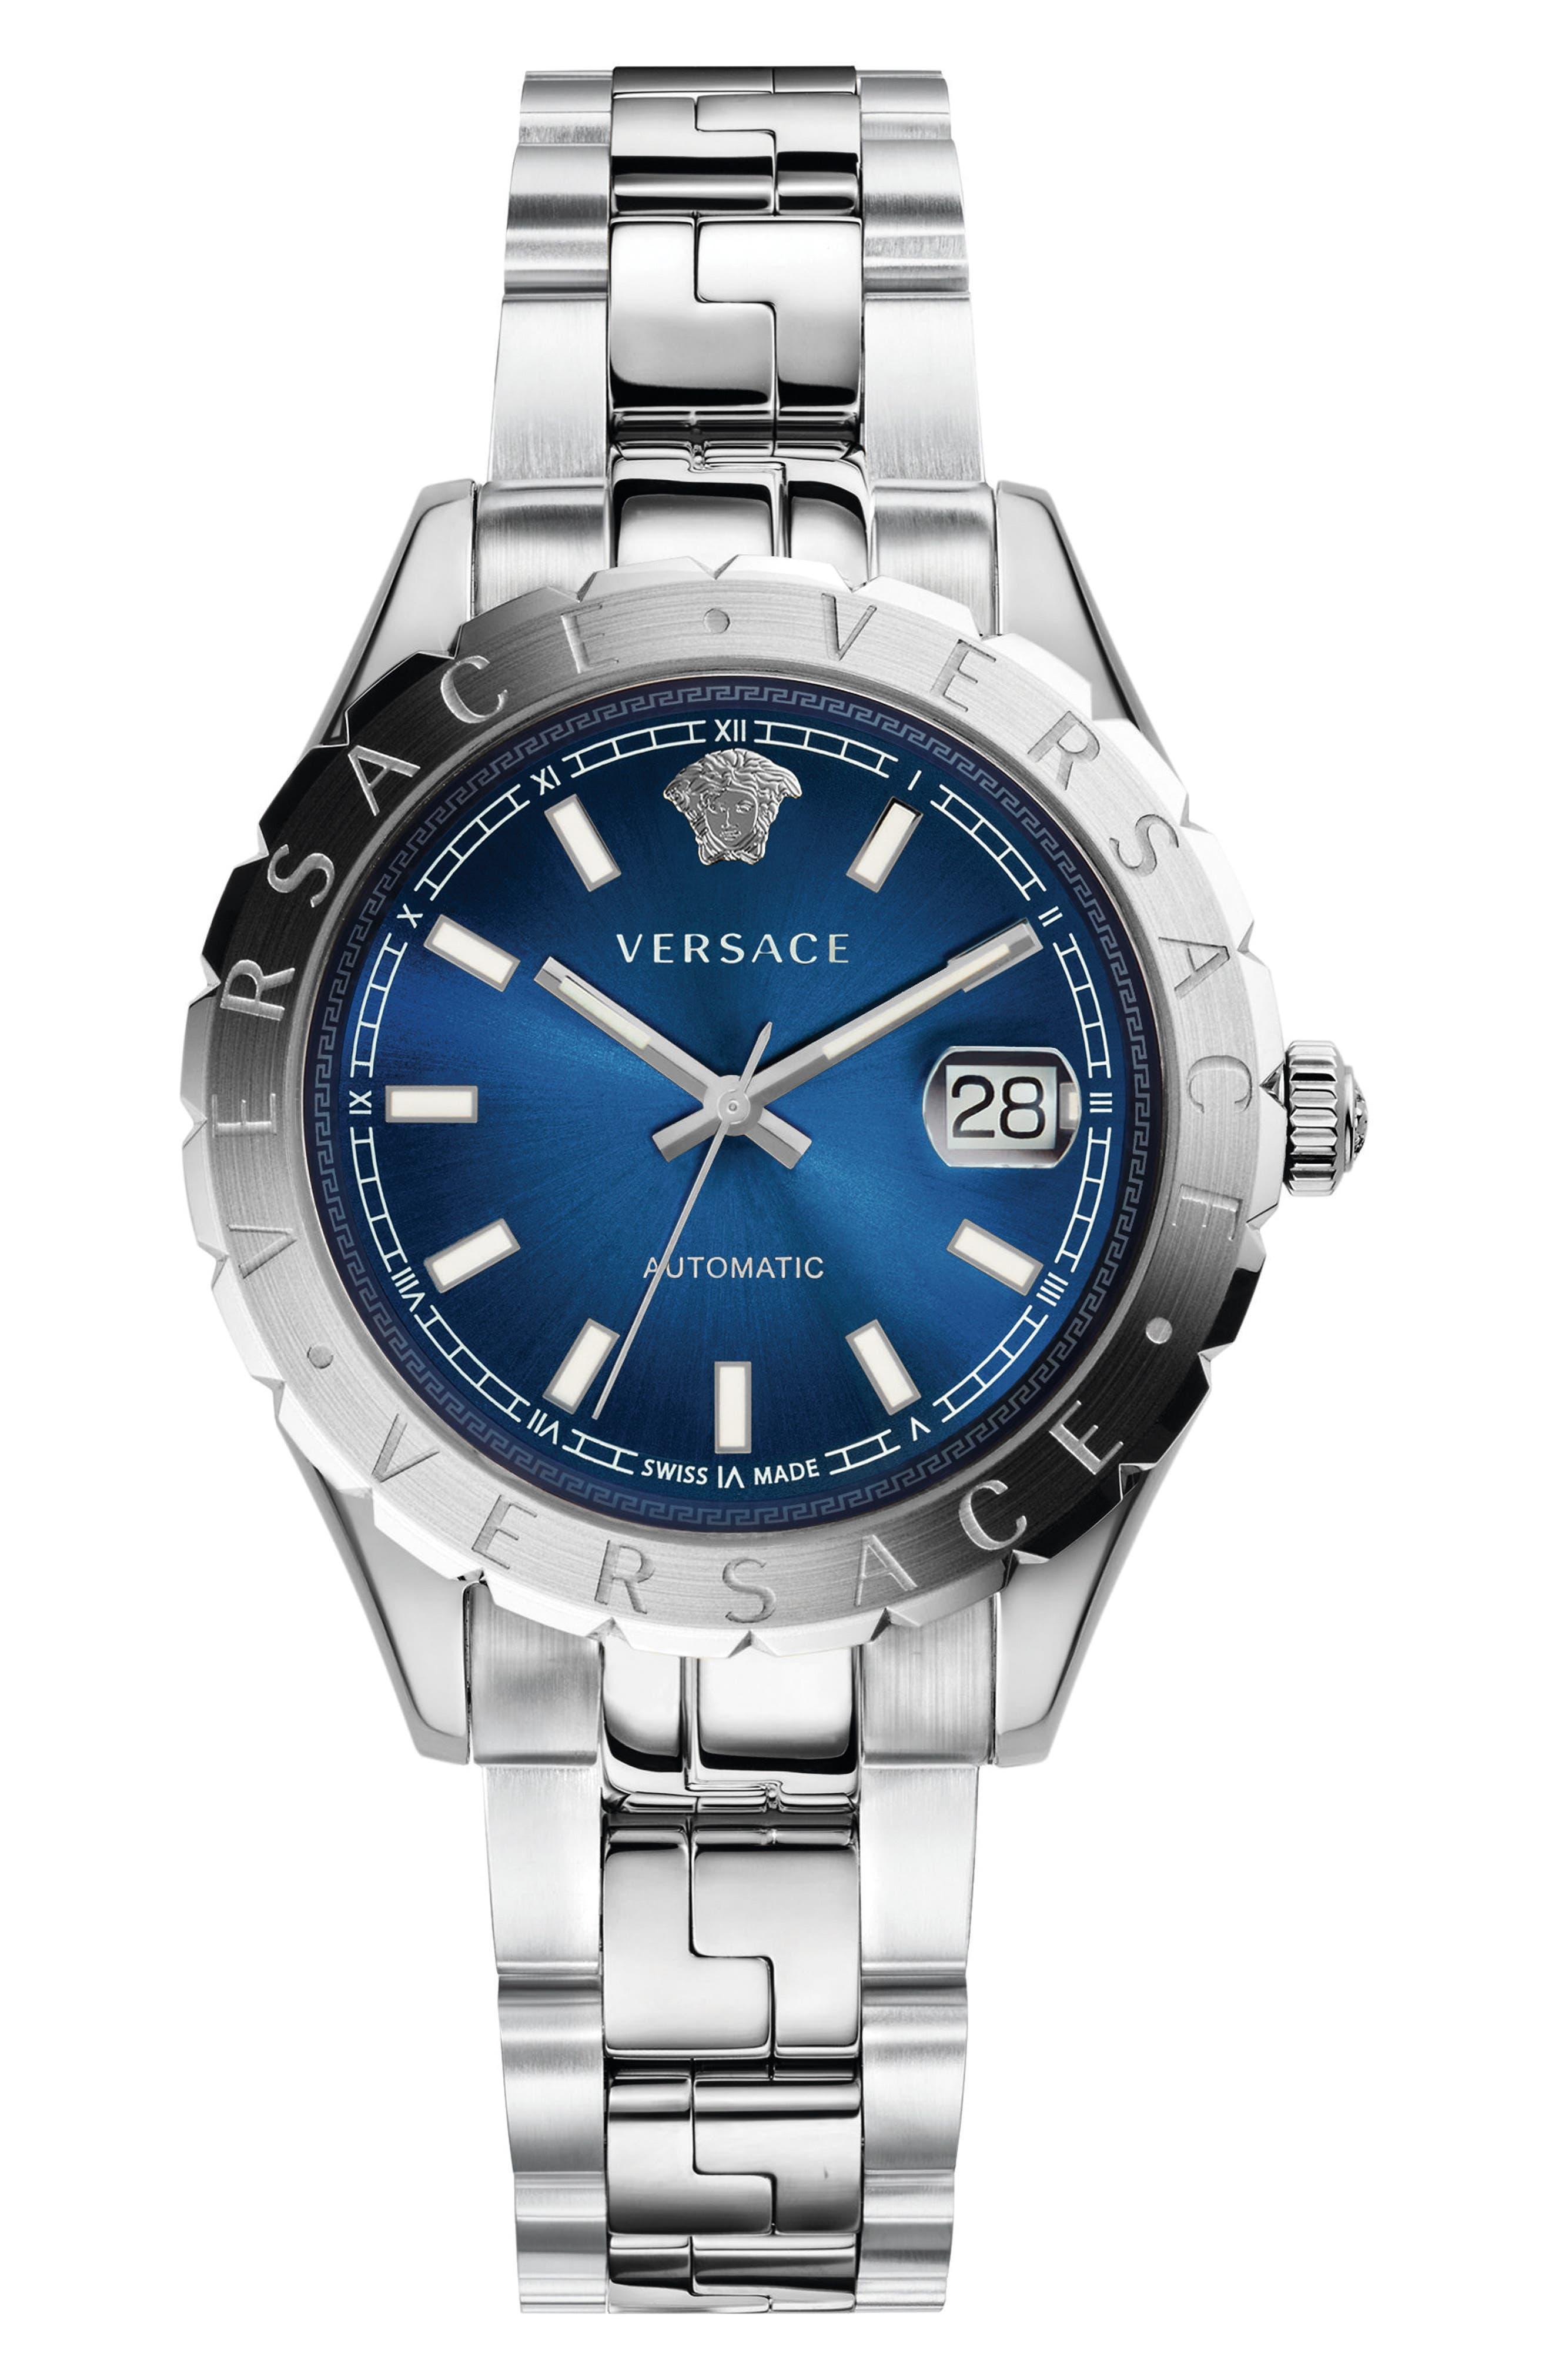 Main Image - Versace Hellenyium Automatic Bracelet Watch, 42mm